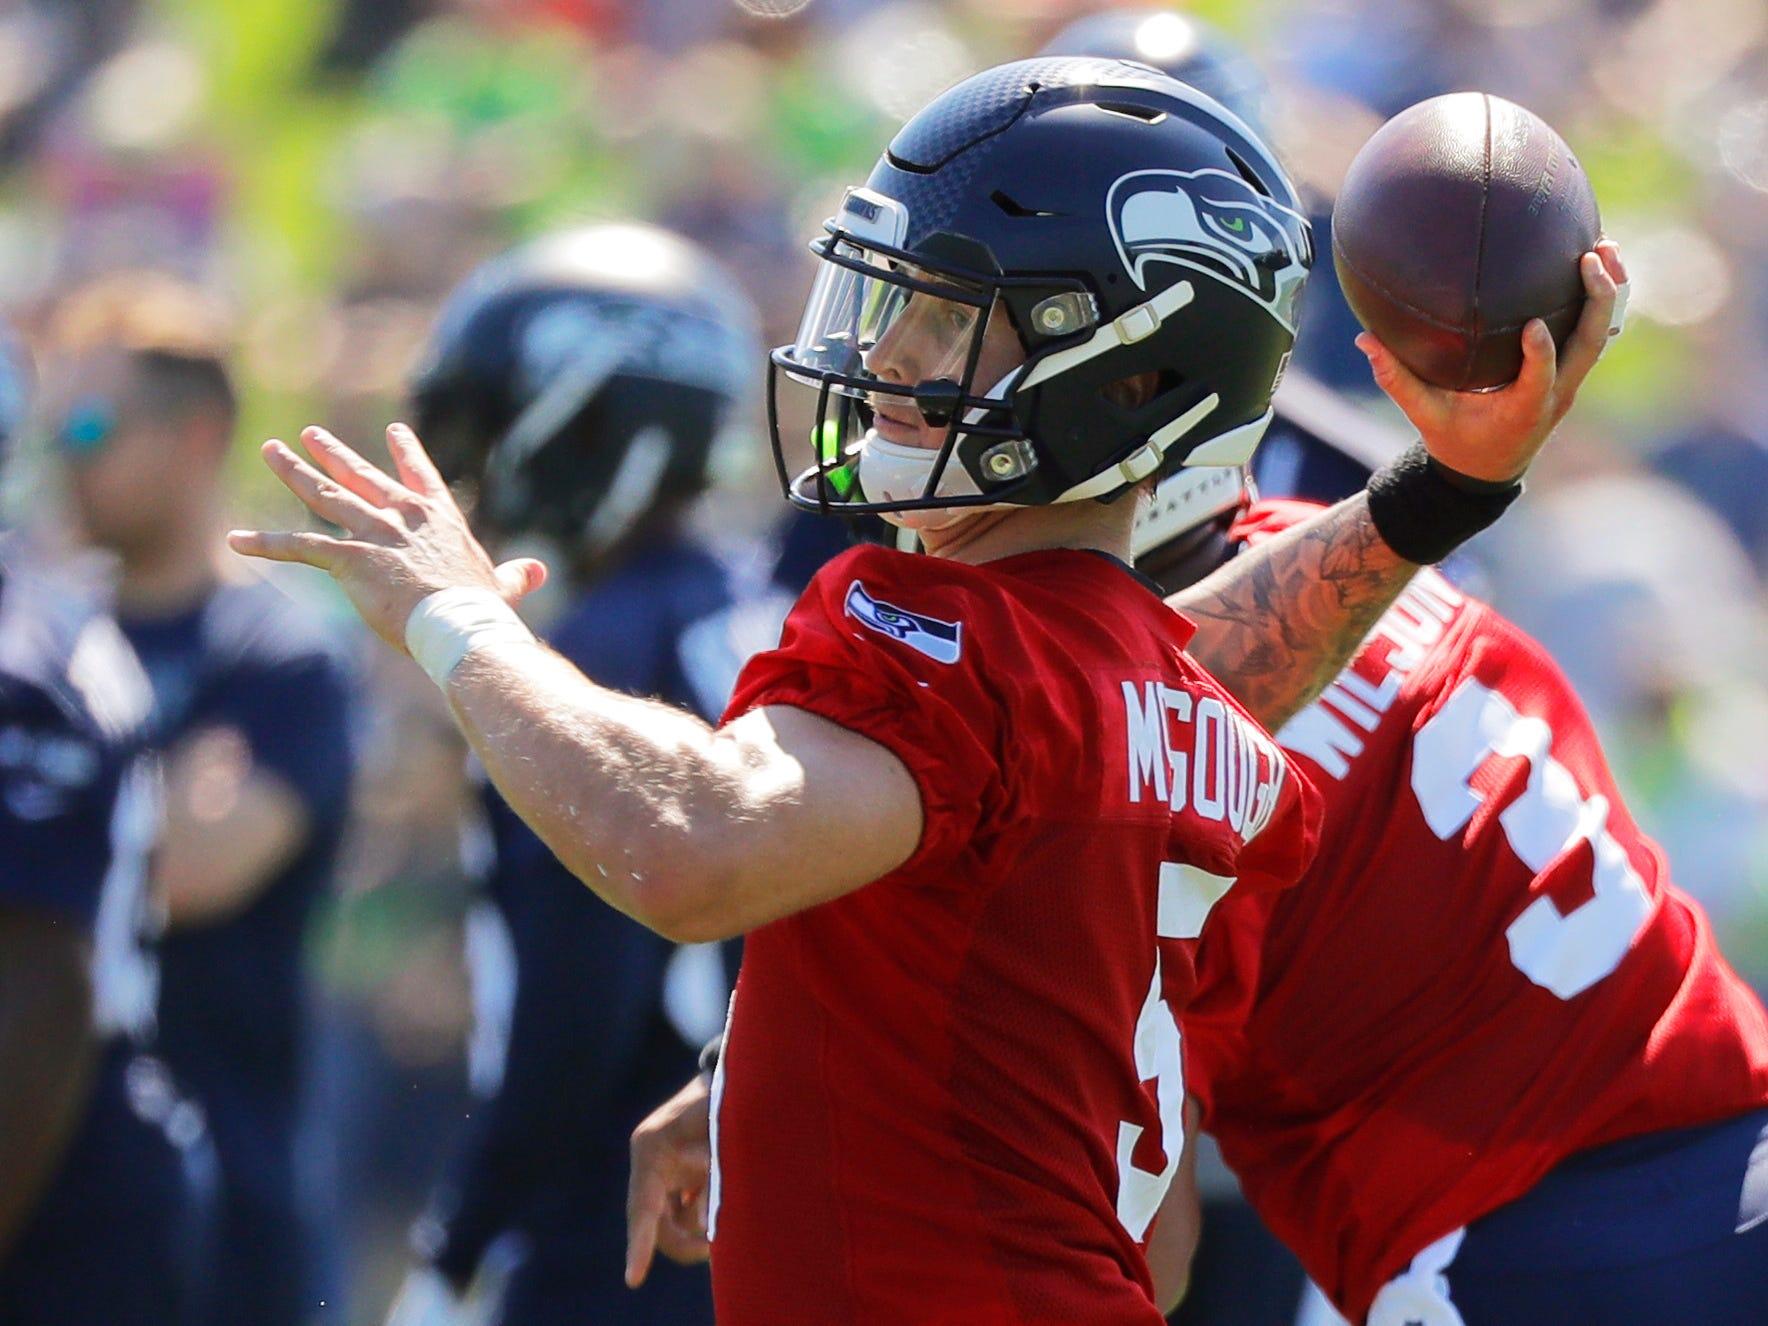 Seattle Seahawks backup quarterback Alex McGough passes during NFL football training camp, Thursday, July 26, 2018, in Renton, Wash. (AP Photo/Ted S. Warren)